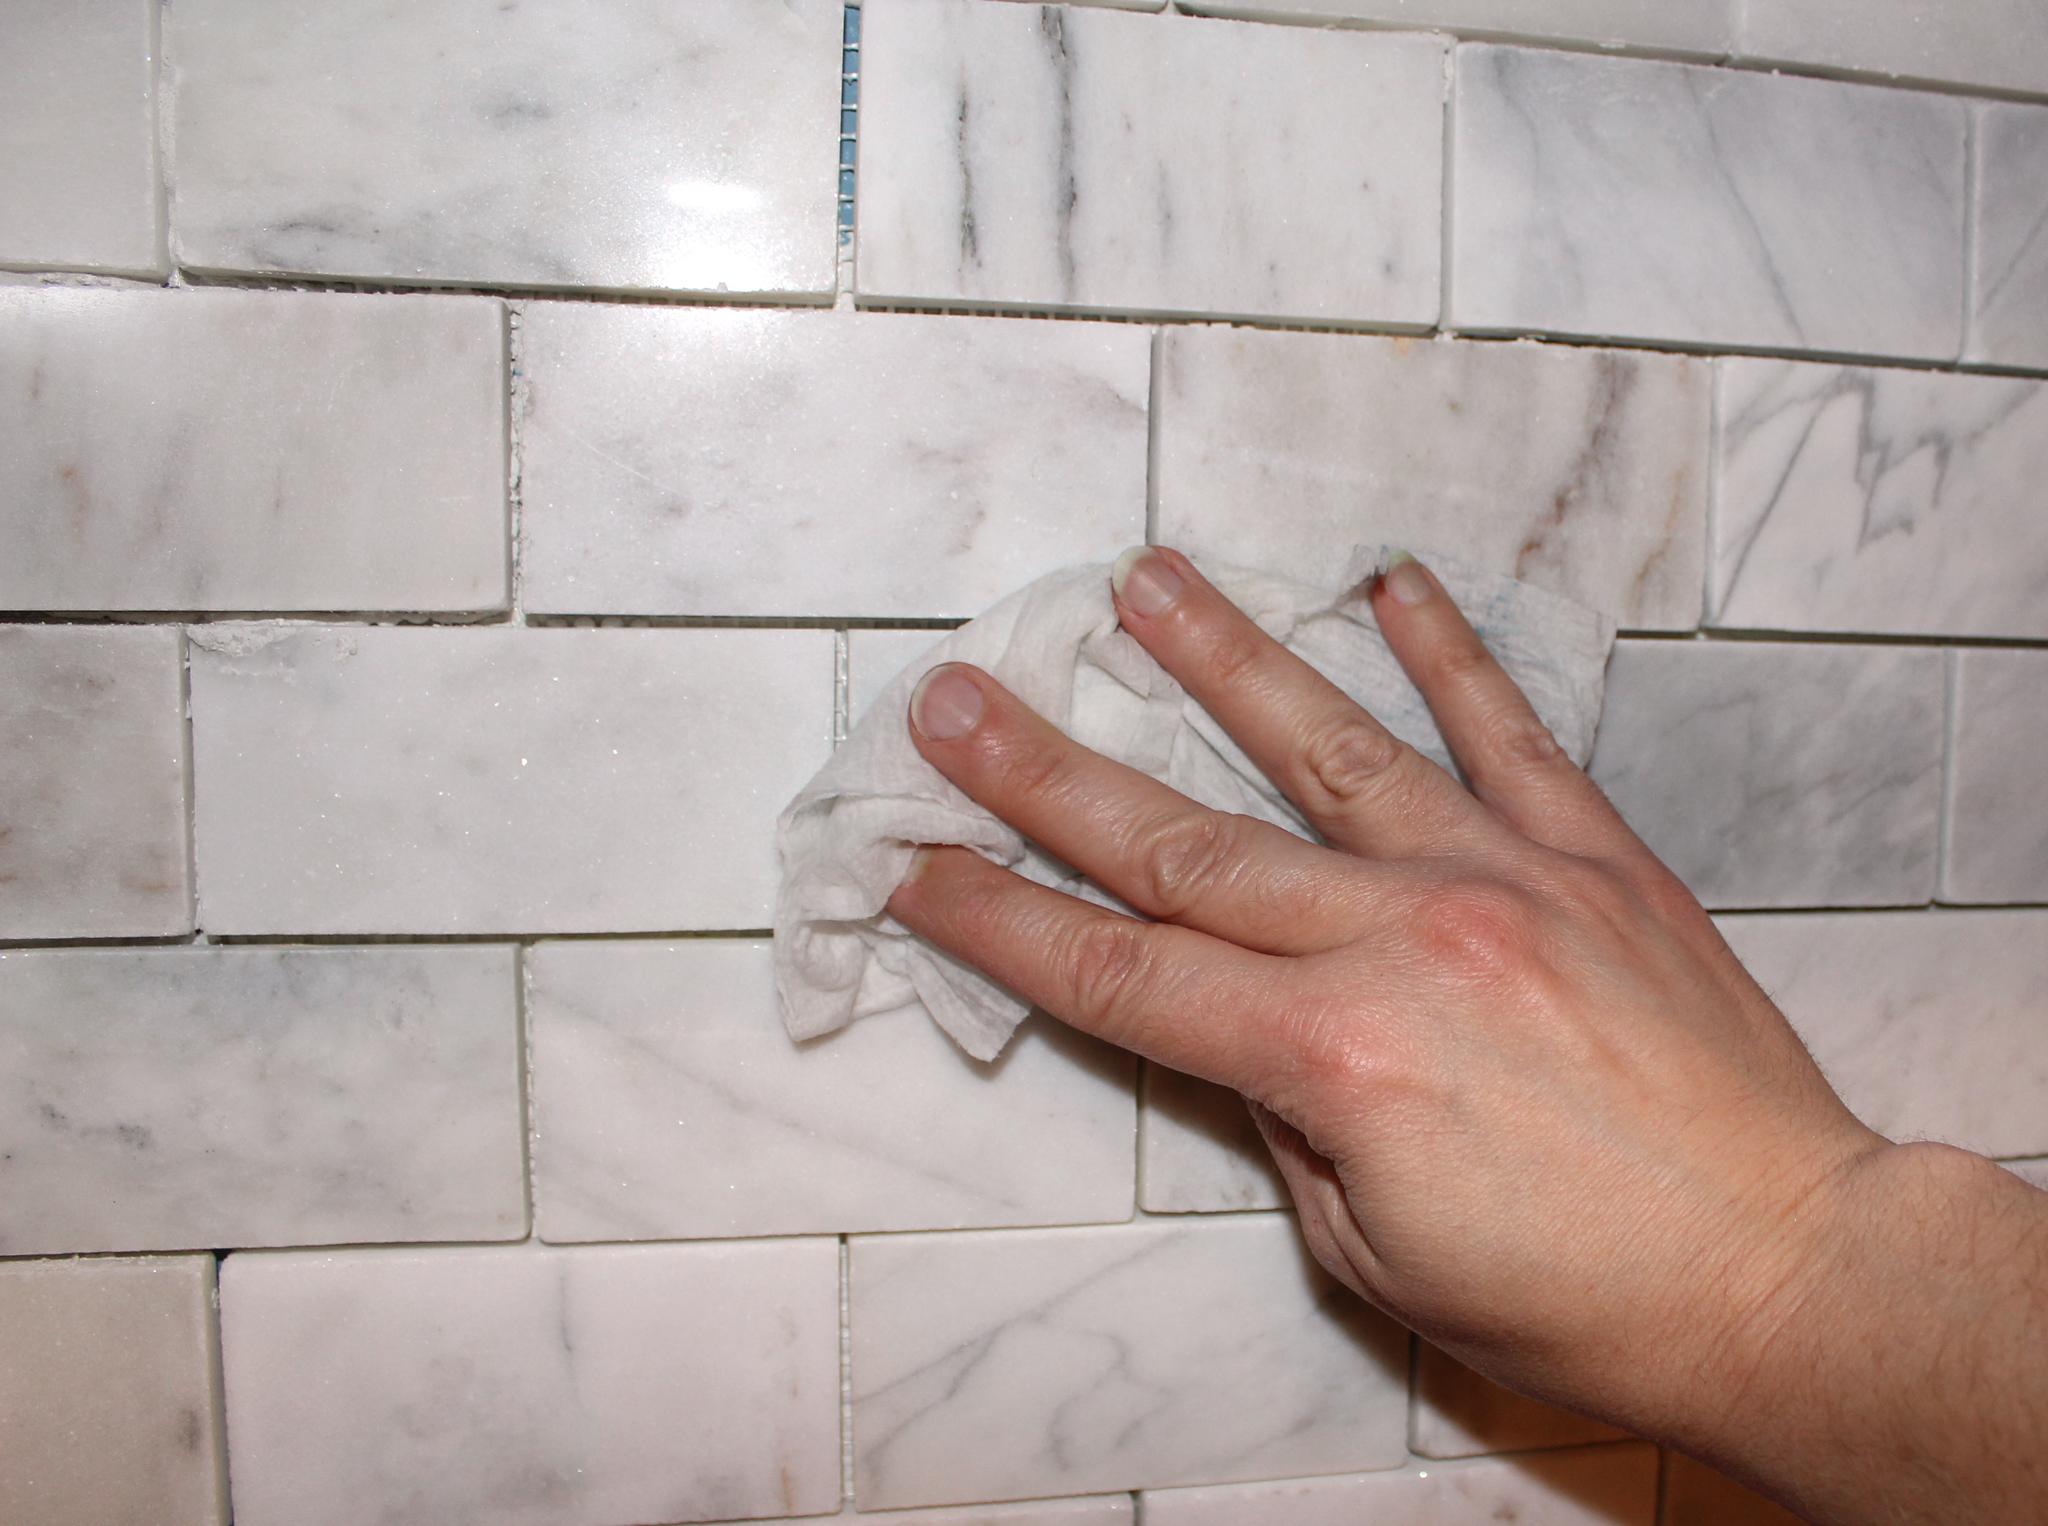 Installing marble tile backsplash columbialabelsfo how to install a marble tile backsplash hgtv dailygadgetfo Gallery